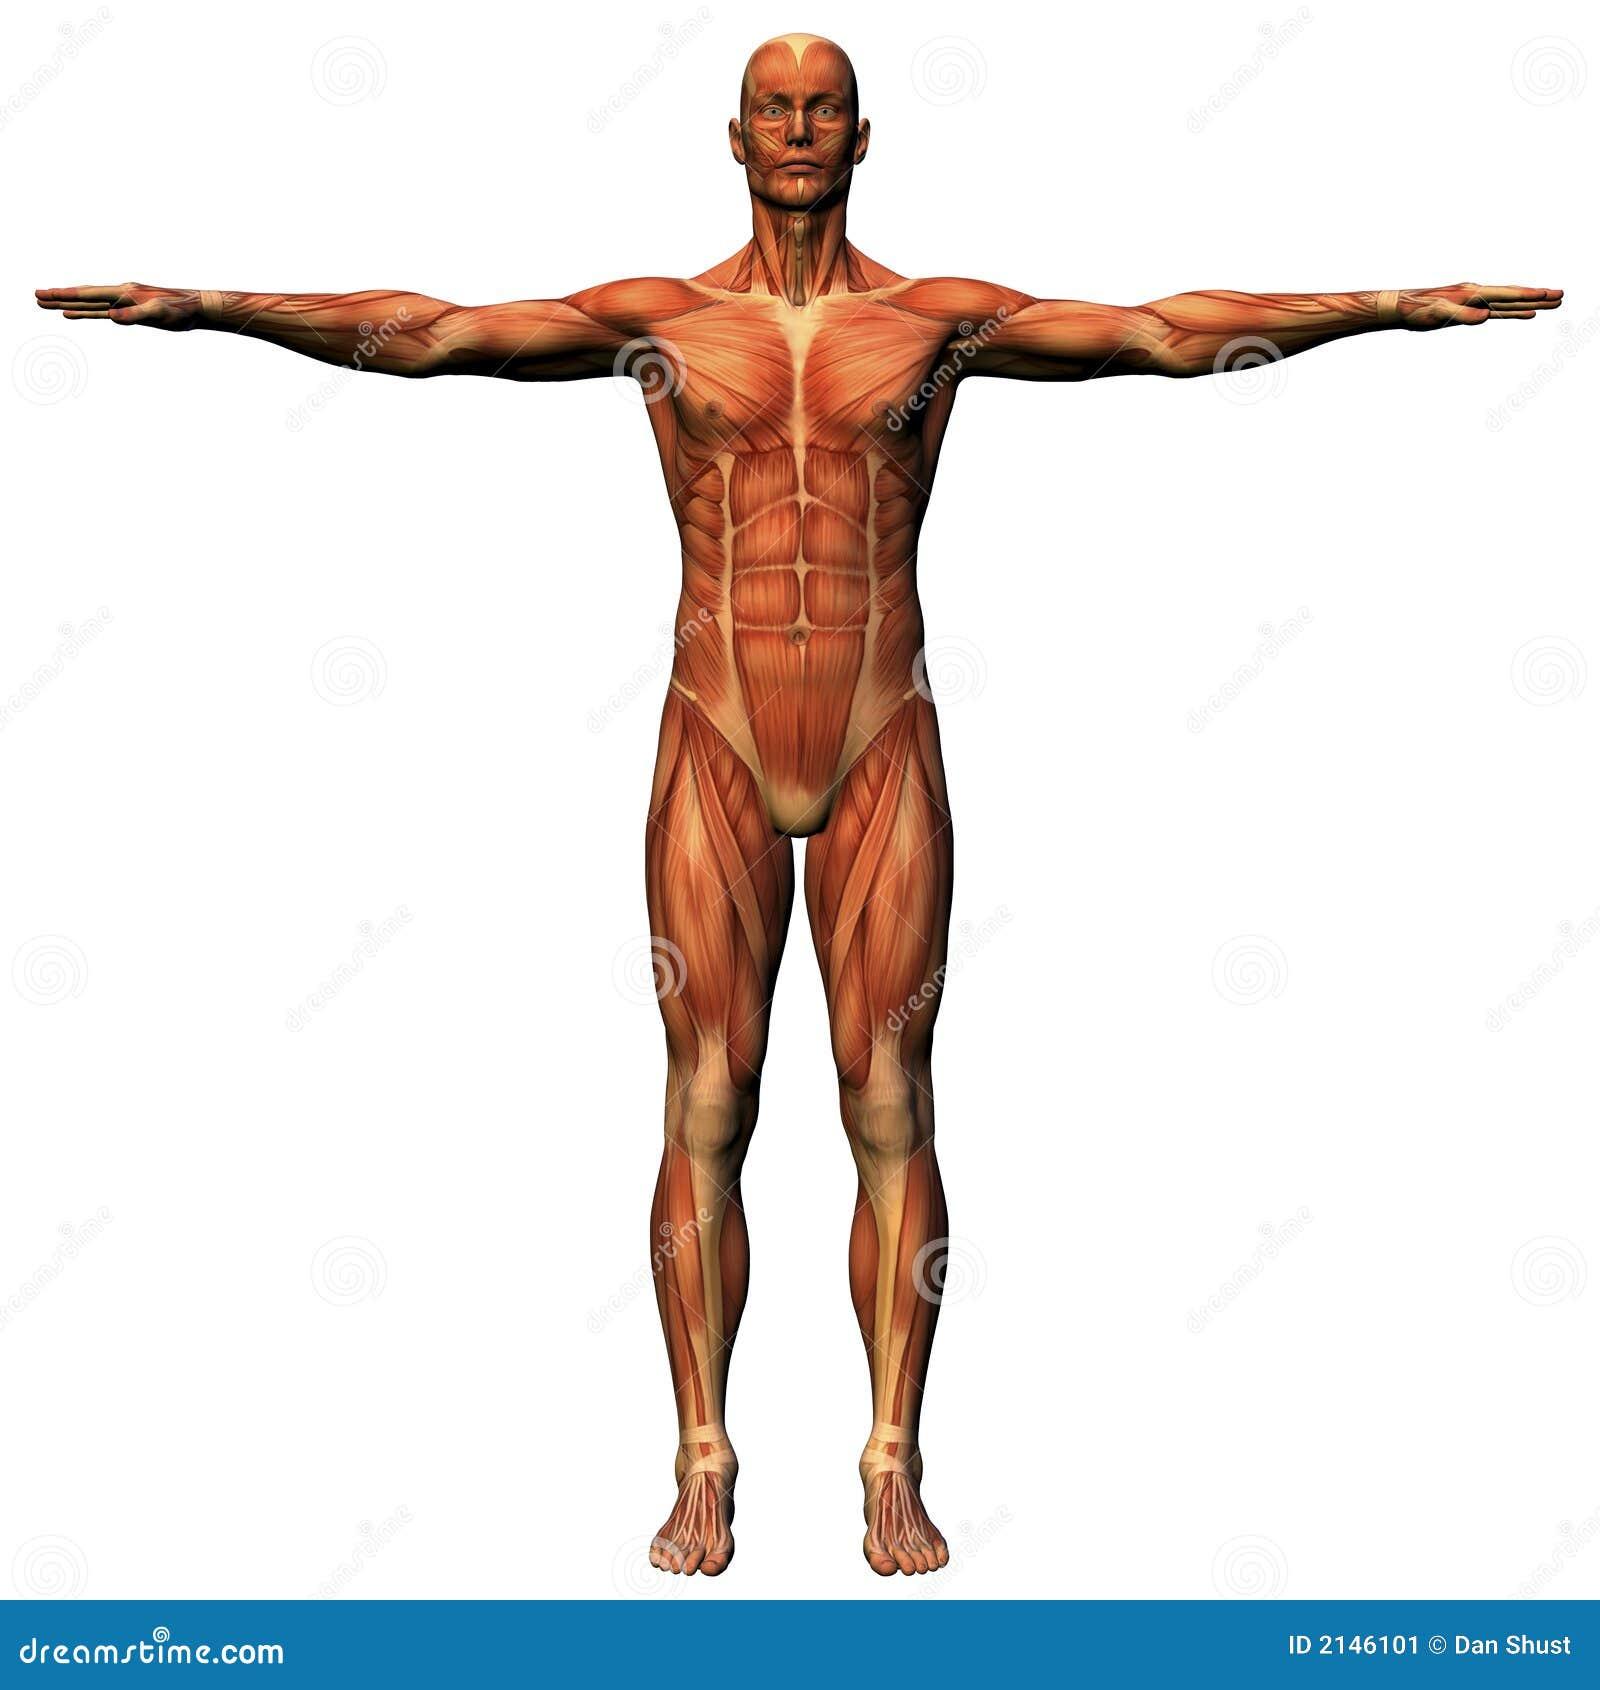 Male anatomy - musculature stock illustration. Illustration of ...